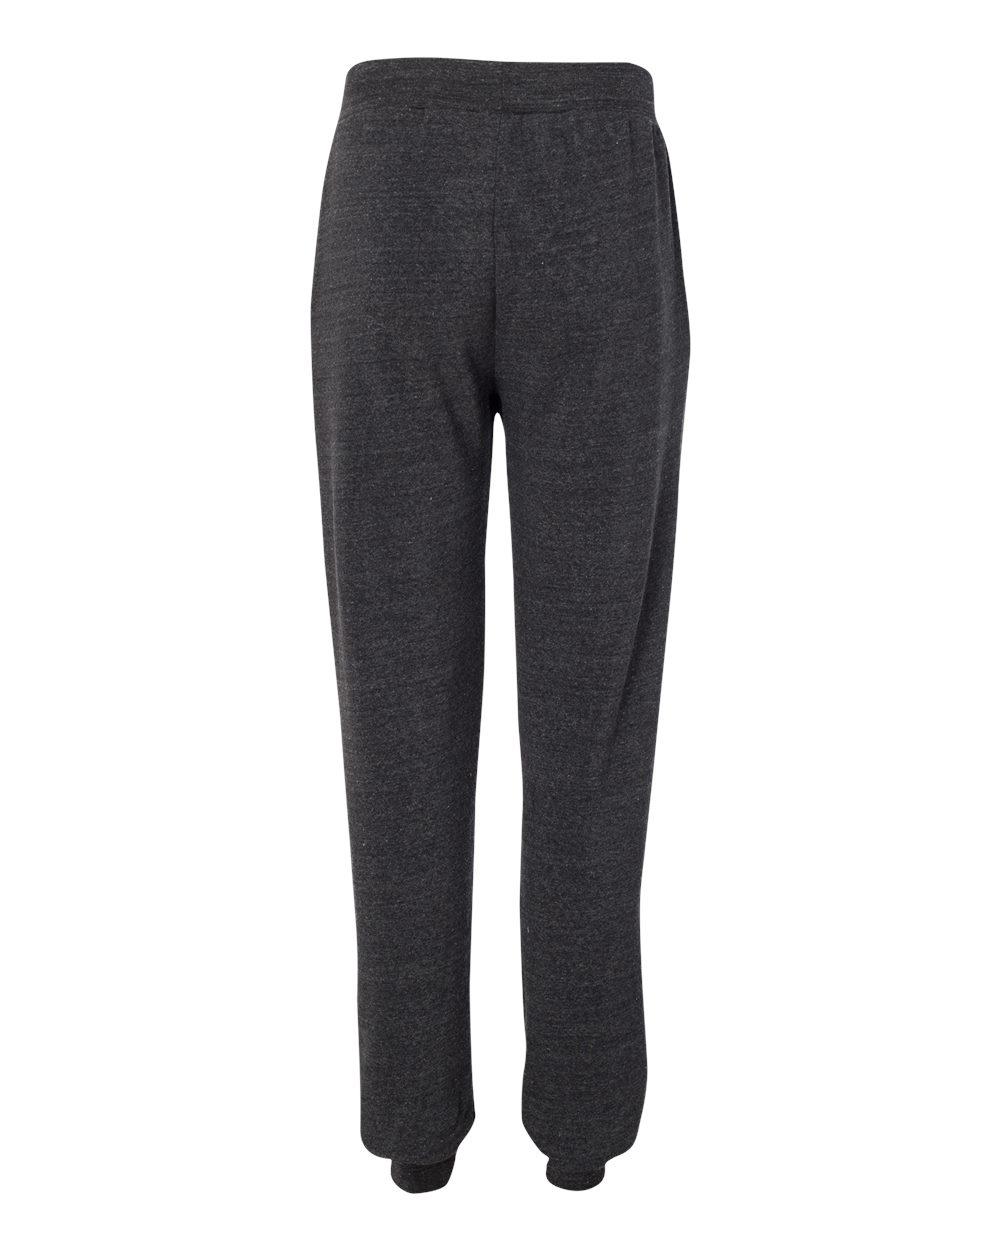 Alternative-Mens-Eco-Fleece-Dodgeball-Pants-Sweatpants-Pocket-9881-up-to-2XL thumbnail 7